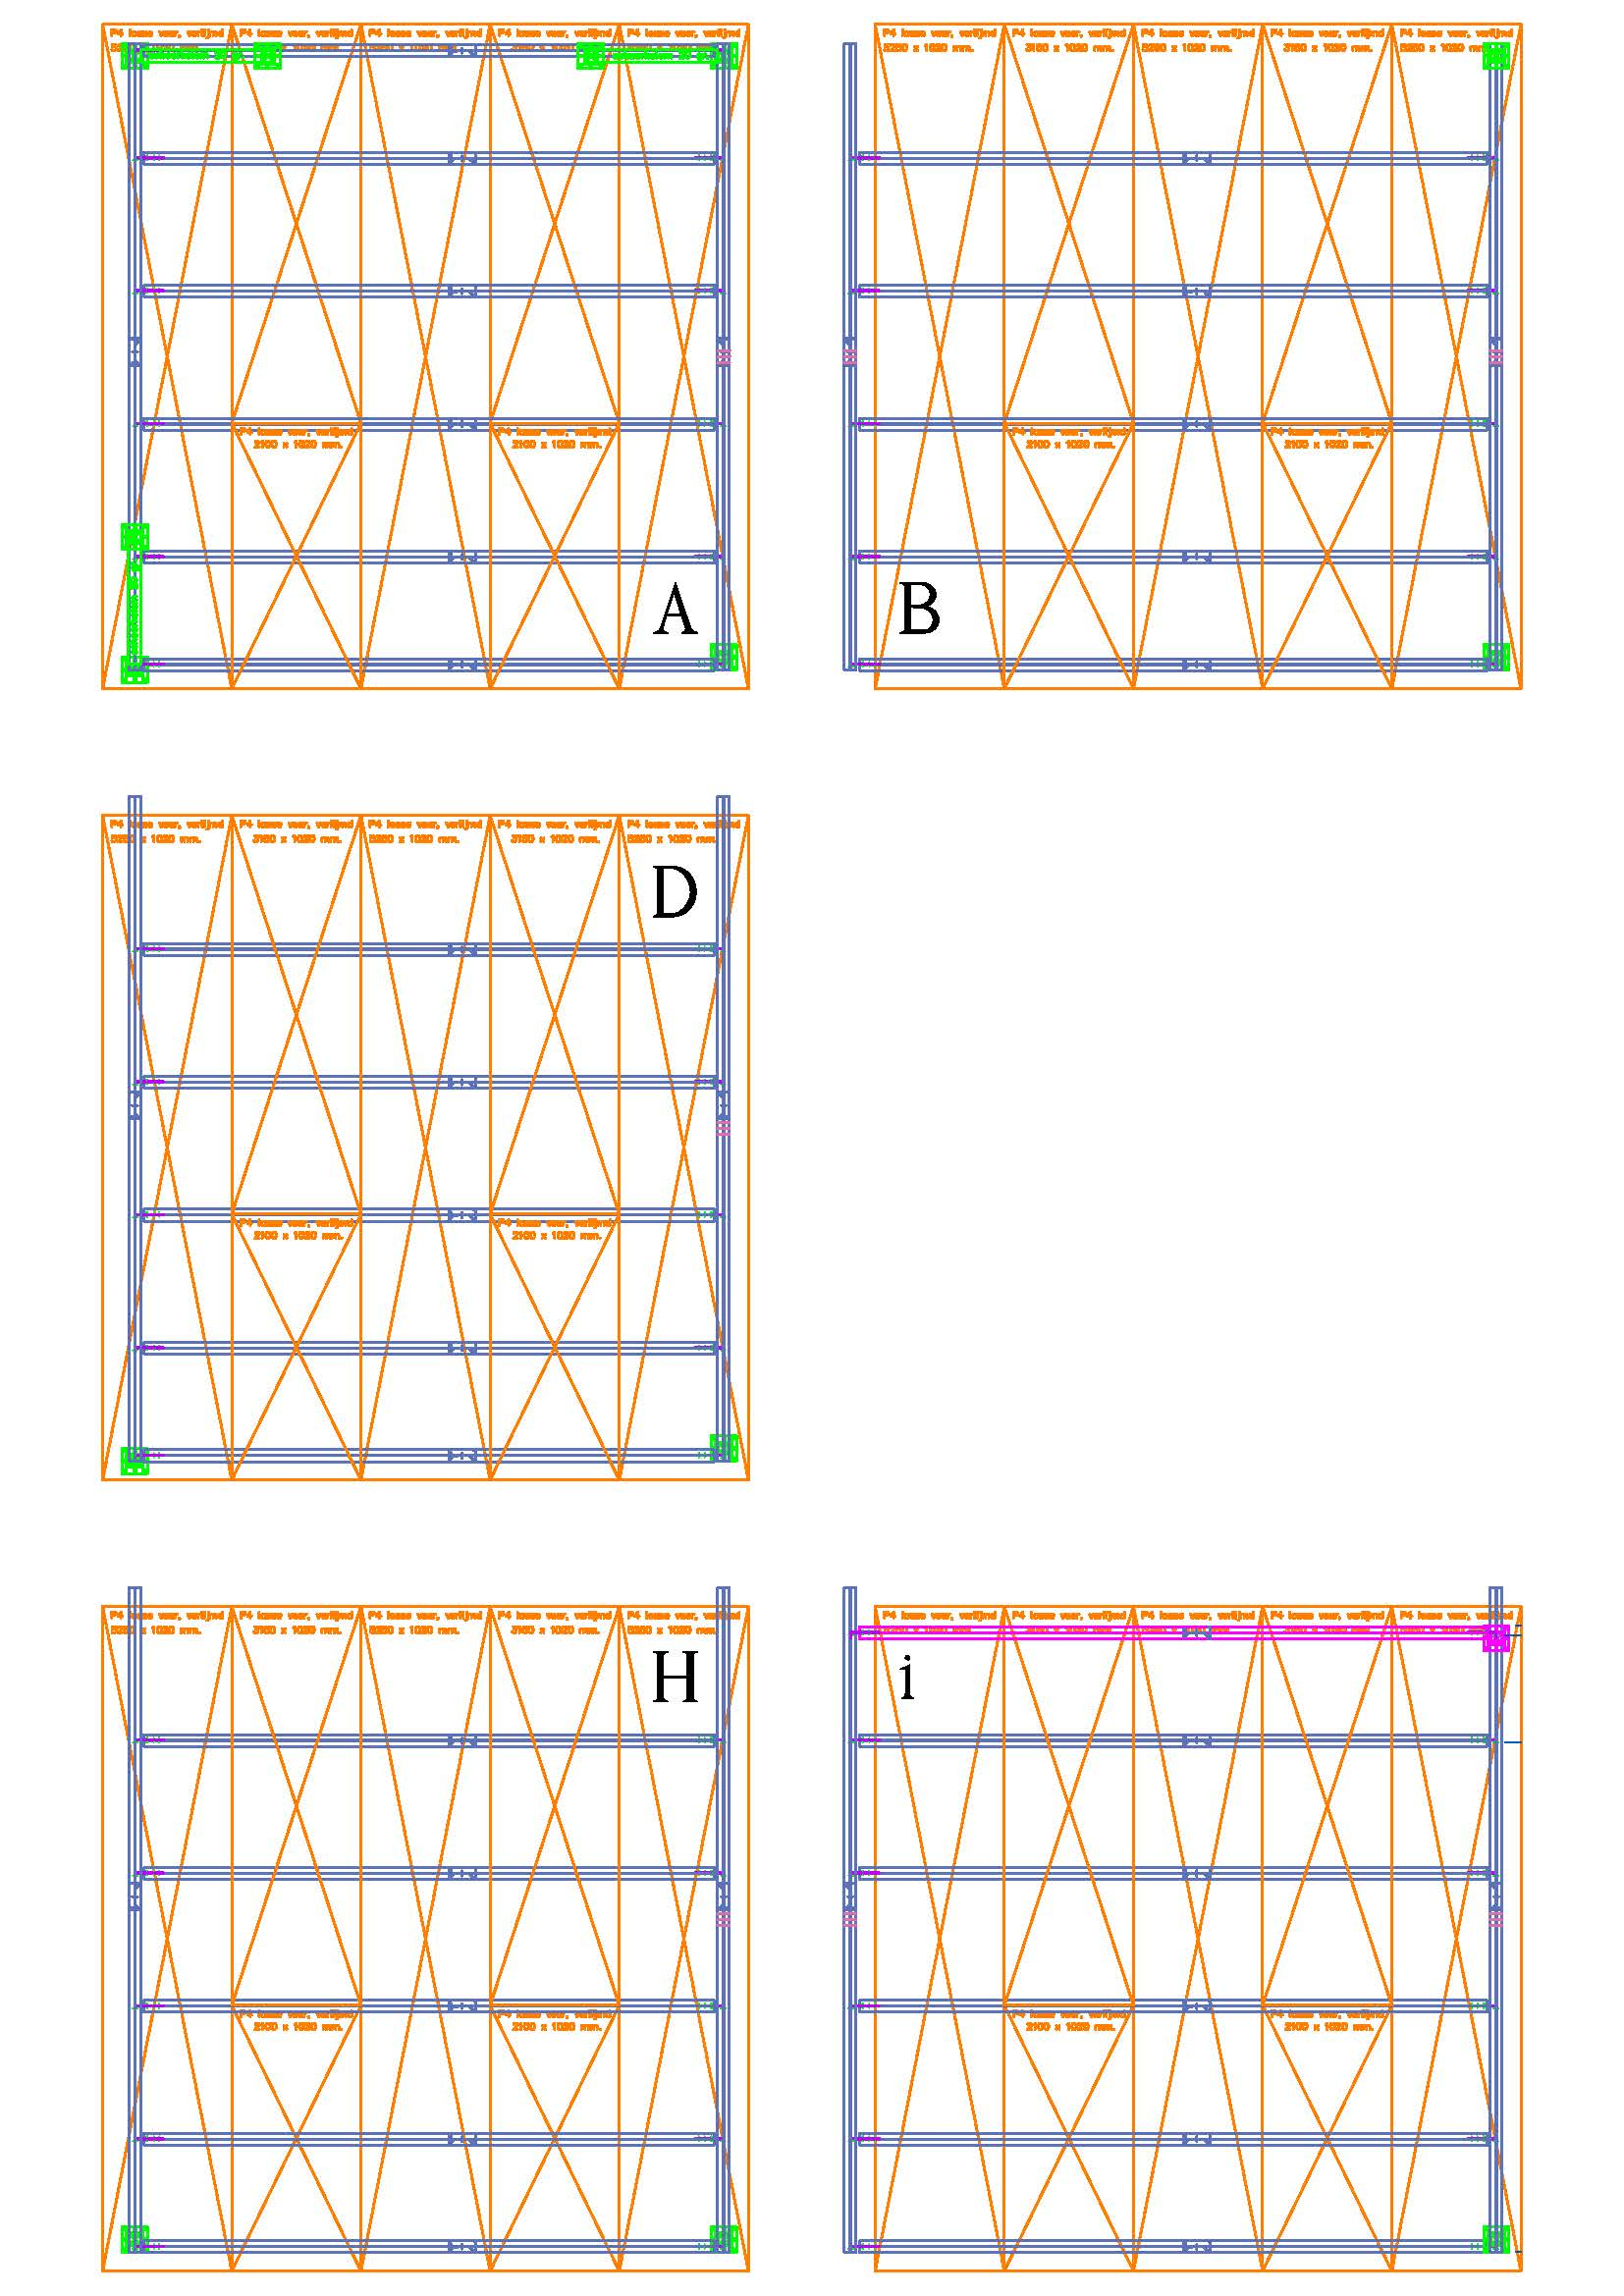 Mezzanine-etagevloer-bordes-entresol-industrieel-platform